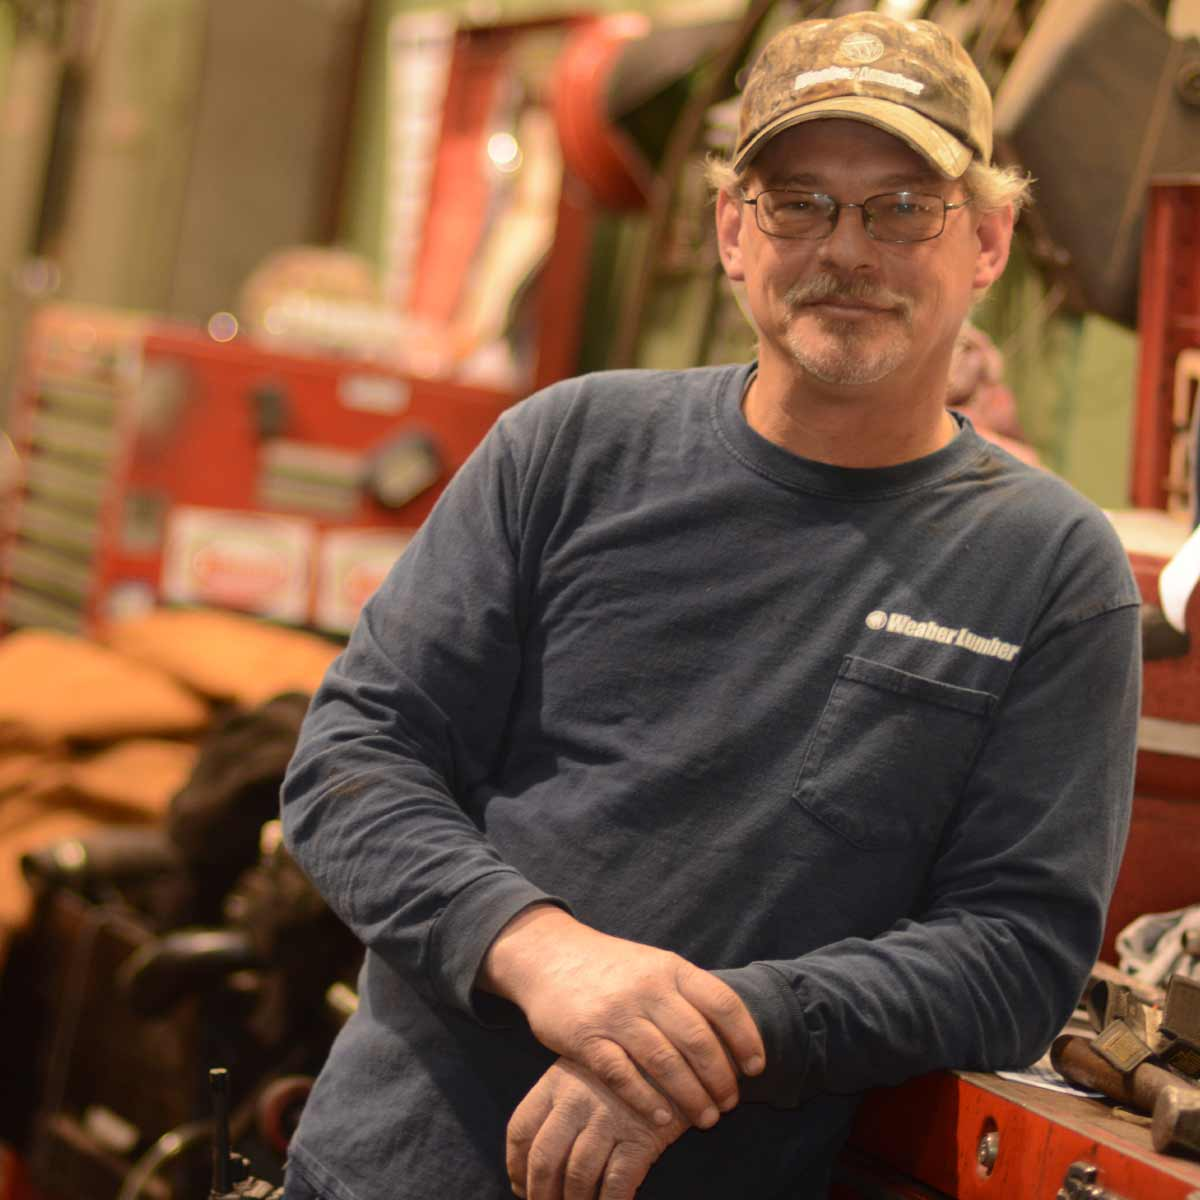 Weaber Lumber Employee in factory